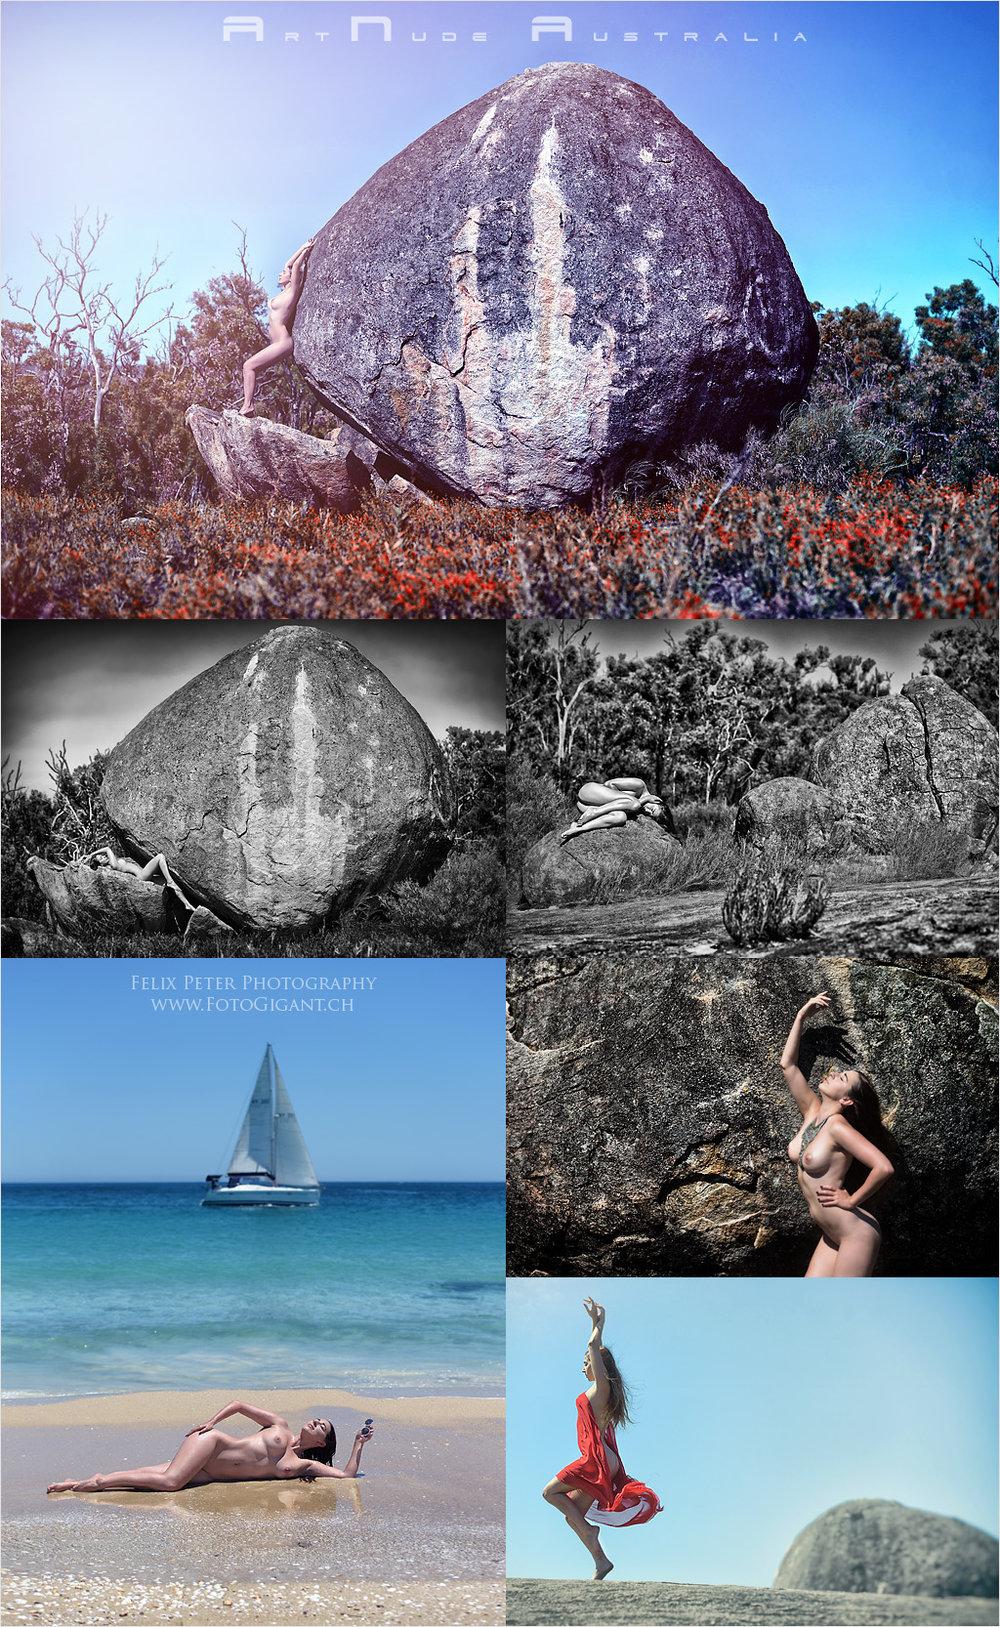 2018-01-13_ArtNude-Photography-Australia.jpg